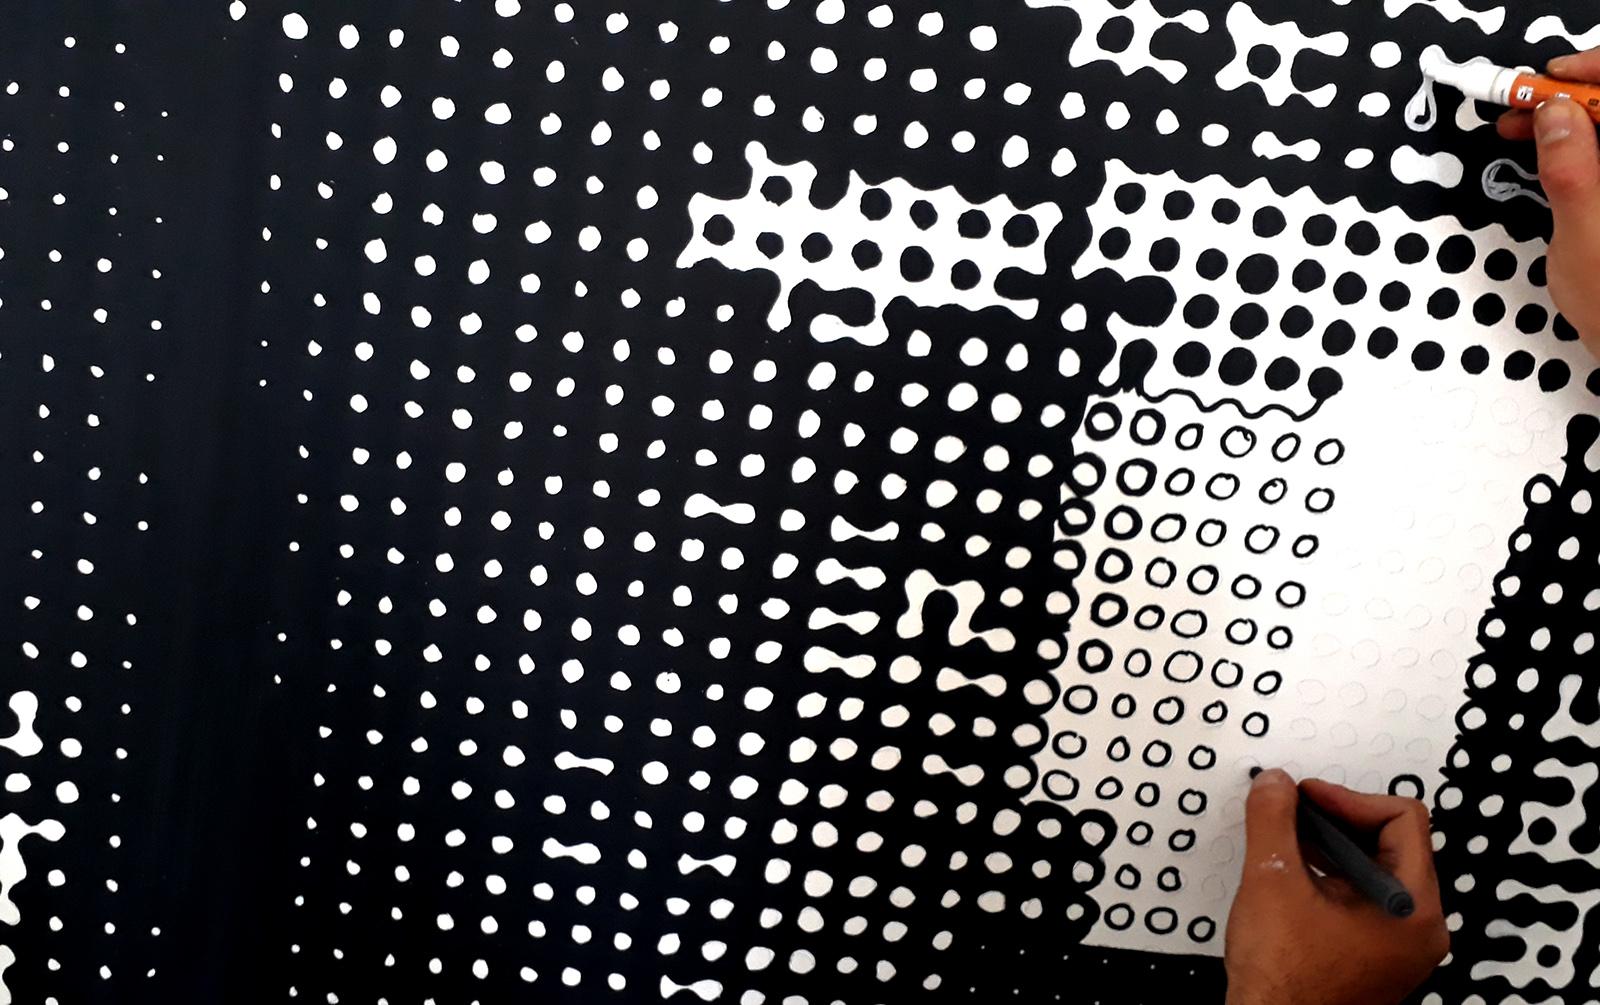 dreher dekor - neopaint works